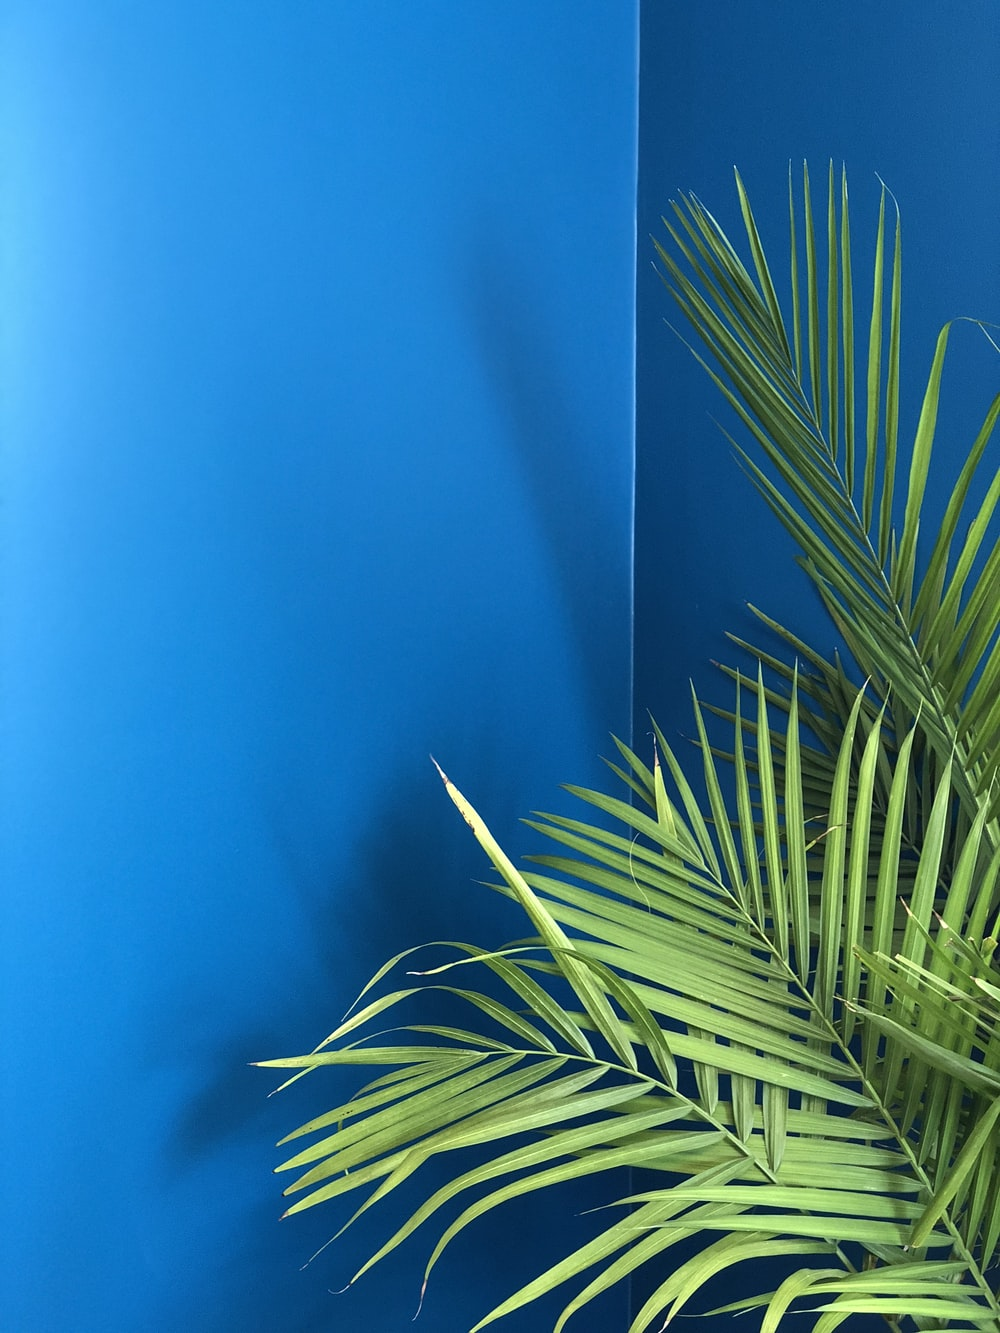 green palm plant near blue wall